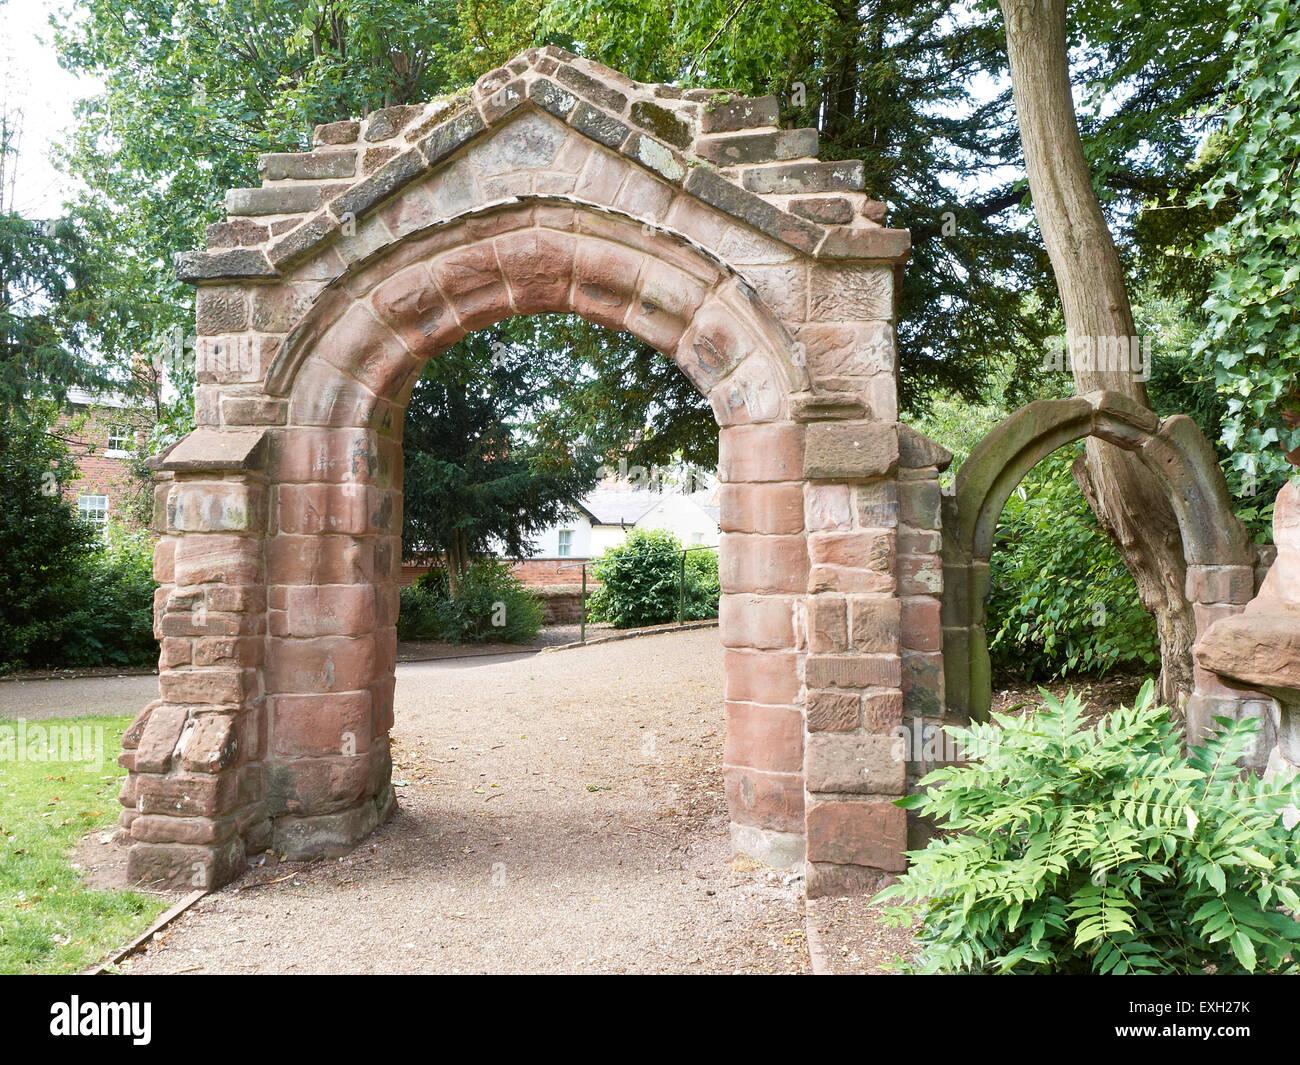 Michaels Garden Stockfotos & Michaels Garden Bilder - Alamy